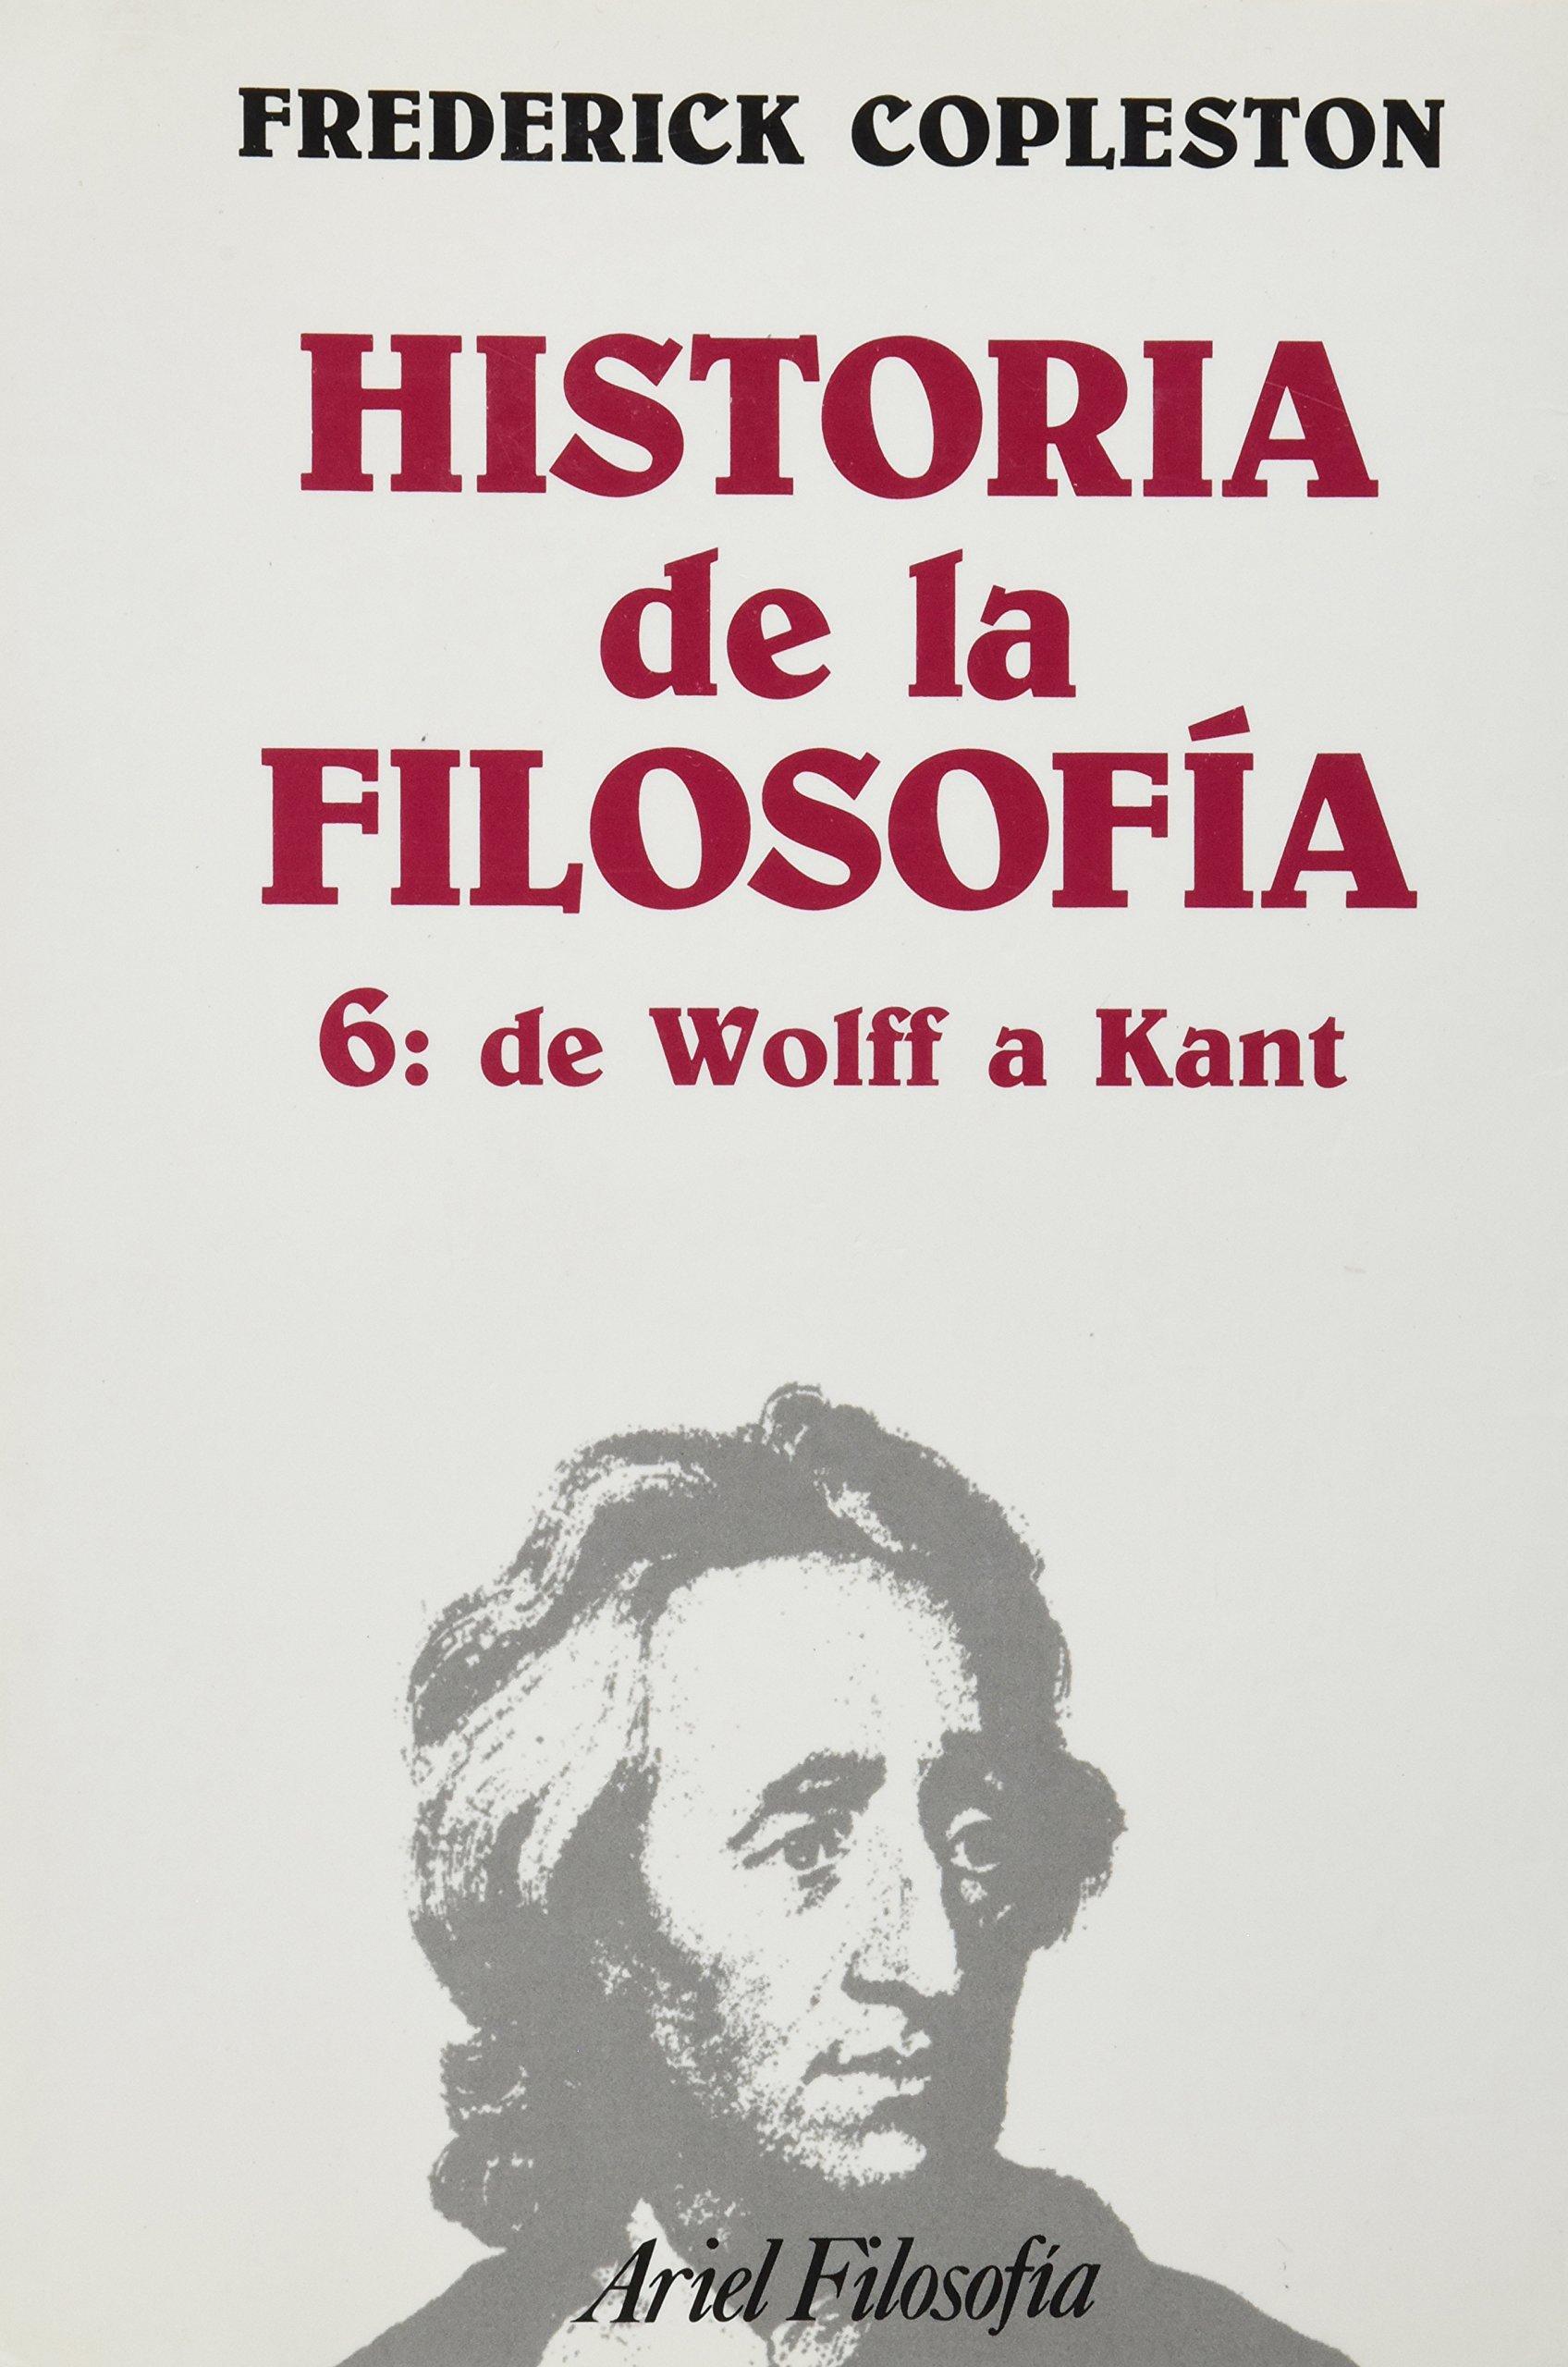 Historia De La Filosofia Frederick Copleston Ebook